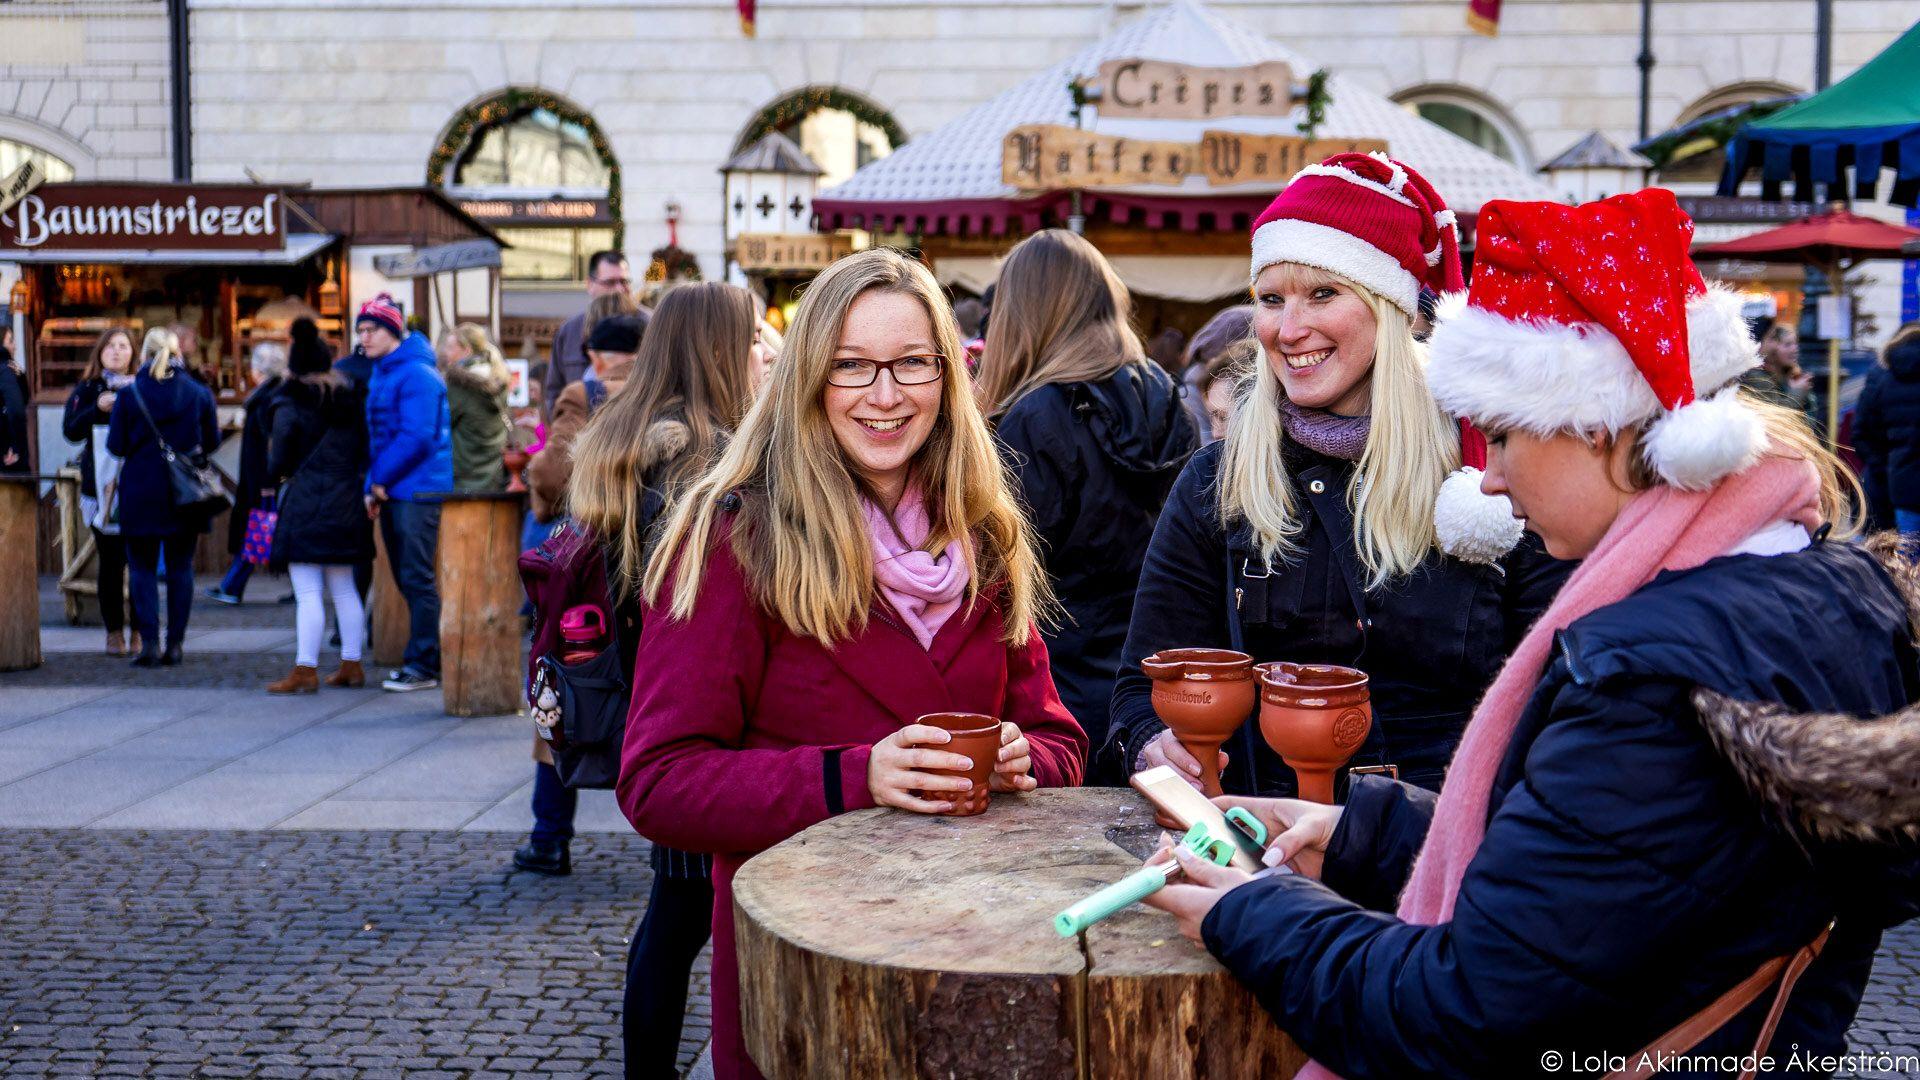 Christmas Market Munich - Christmas Markets in Munich - Munich Christmas Market